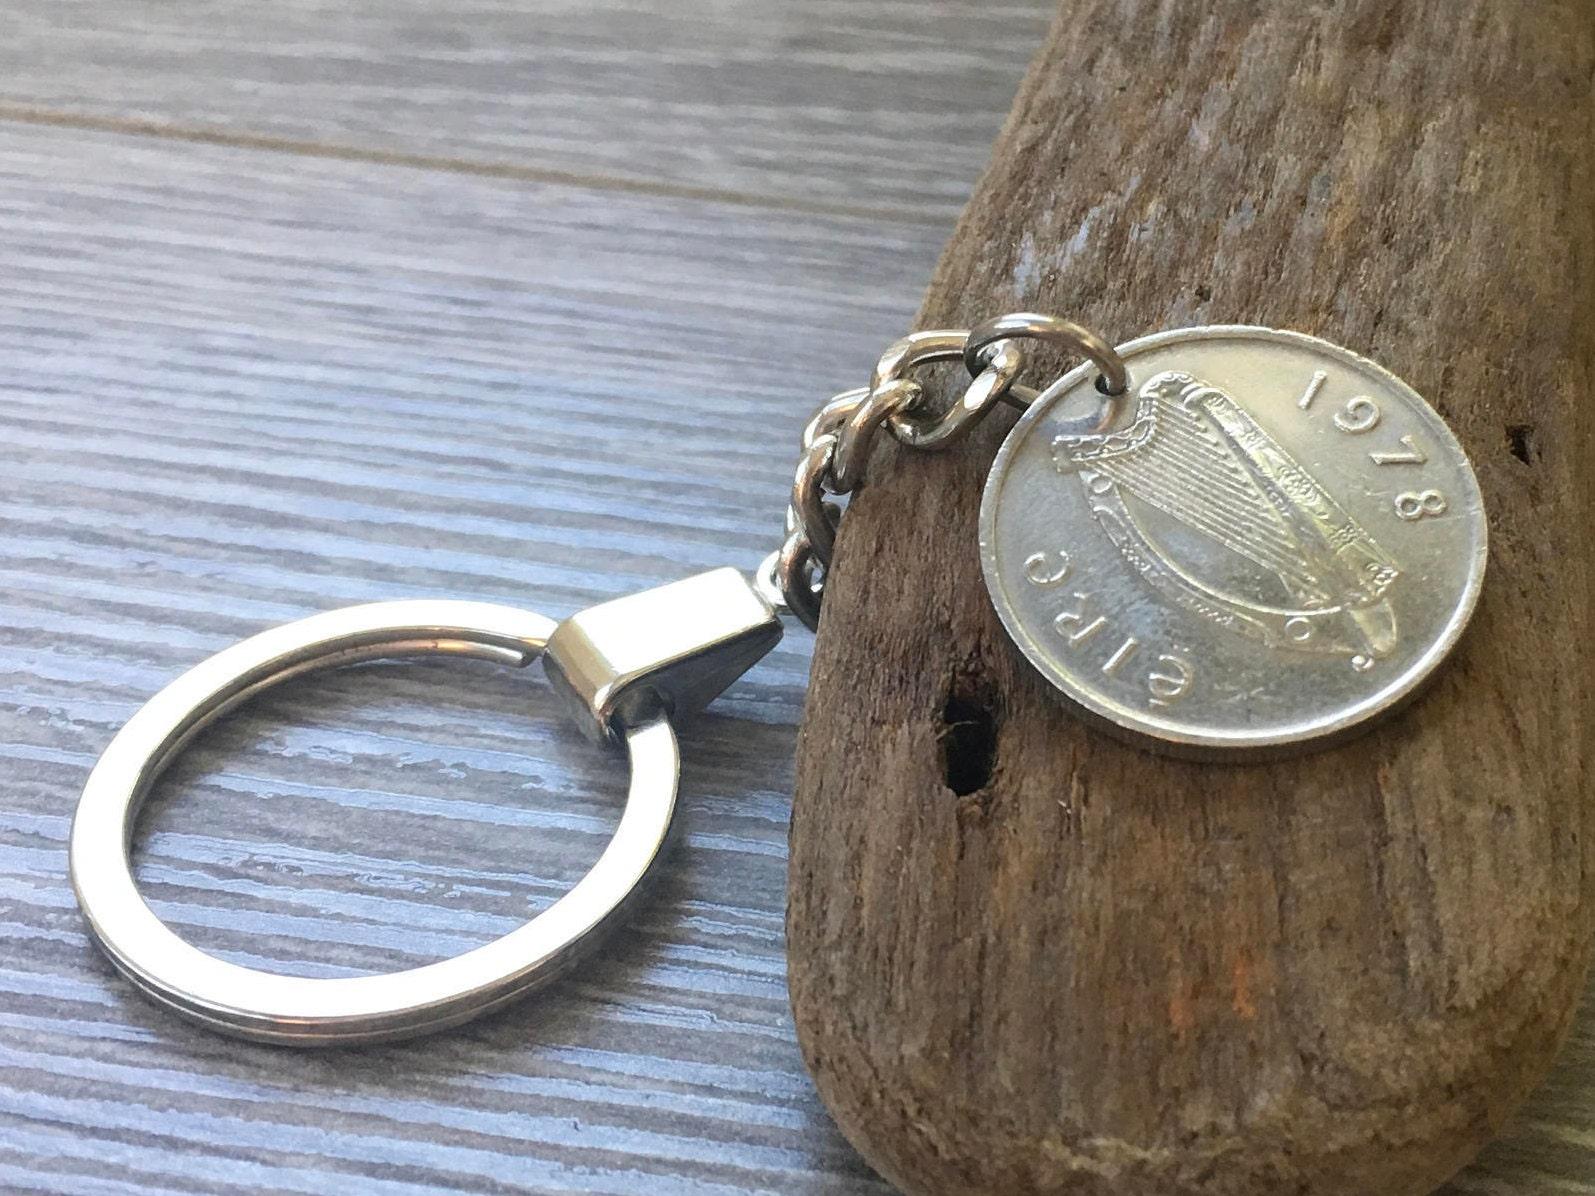 41st Birthday Gift 1978 Irish Coin Keyring St Patricks Key Chain Taurus Bull Anniversary Present For Him Man Uncle Brother Son